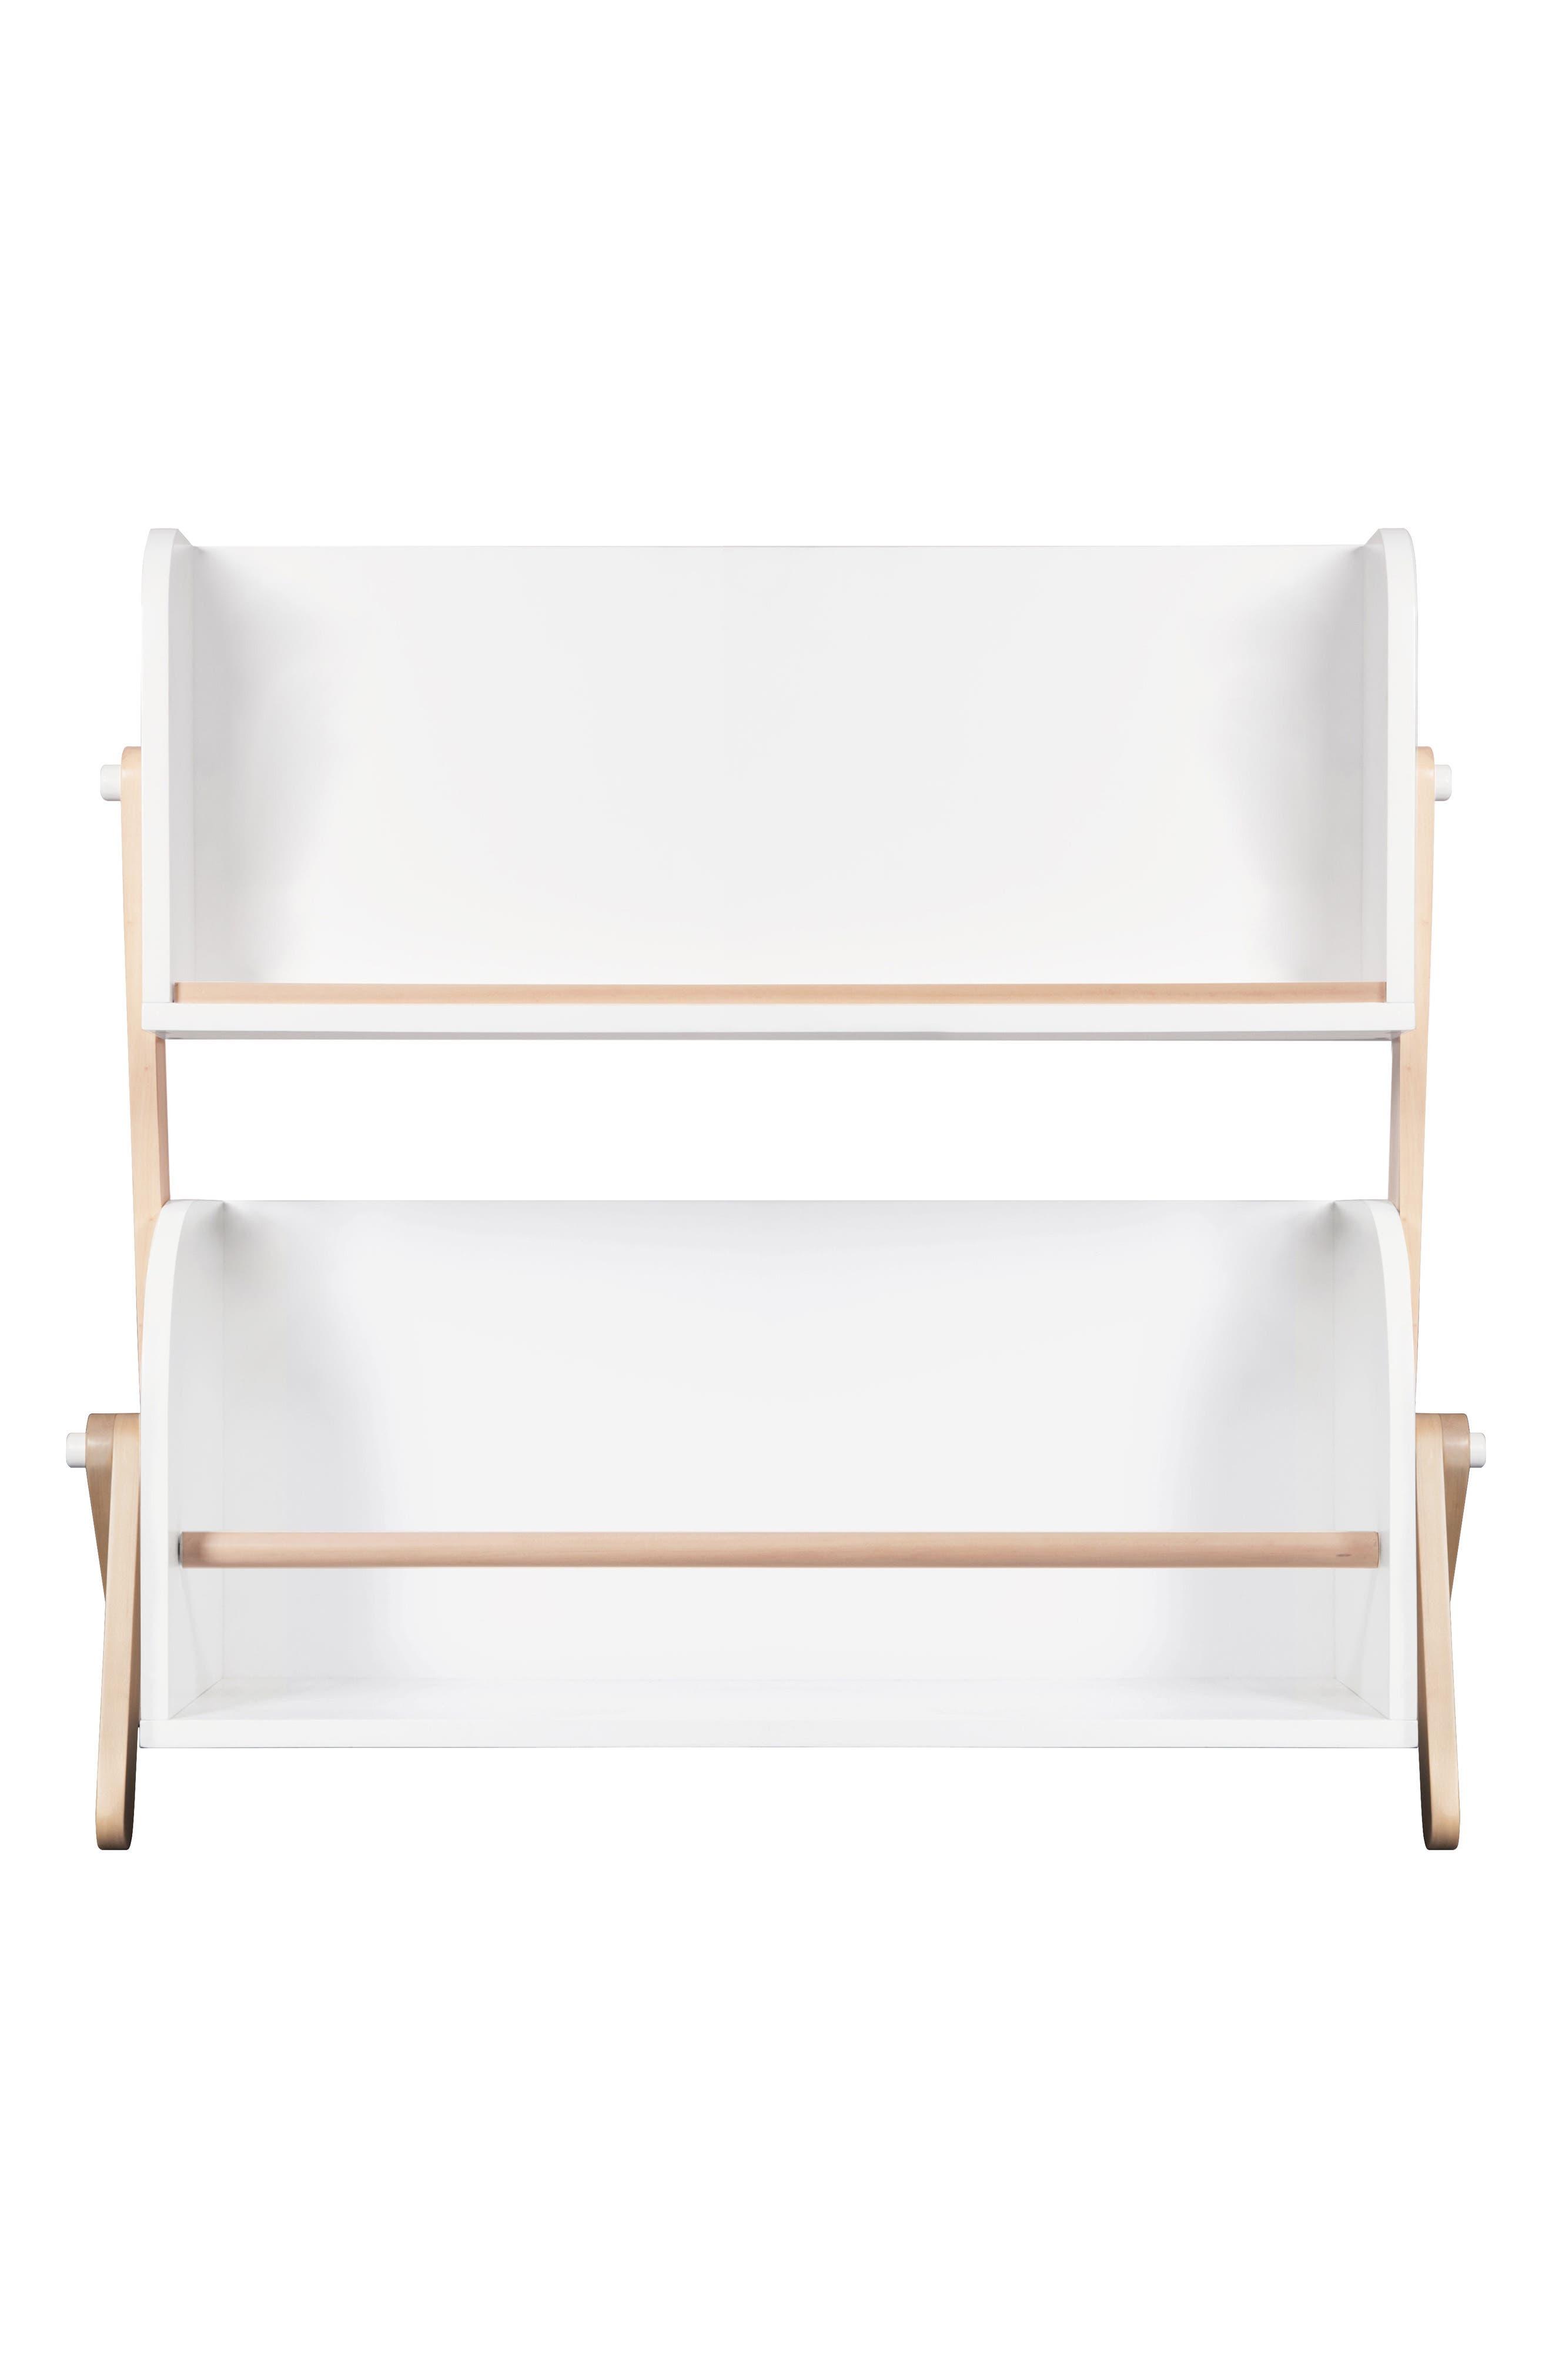 Tally Storage Bookshelf,                             Main thumbnail 1, color,                             WHITE/ NATURAL